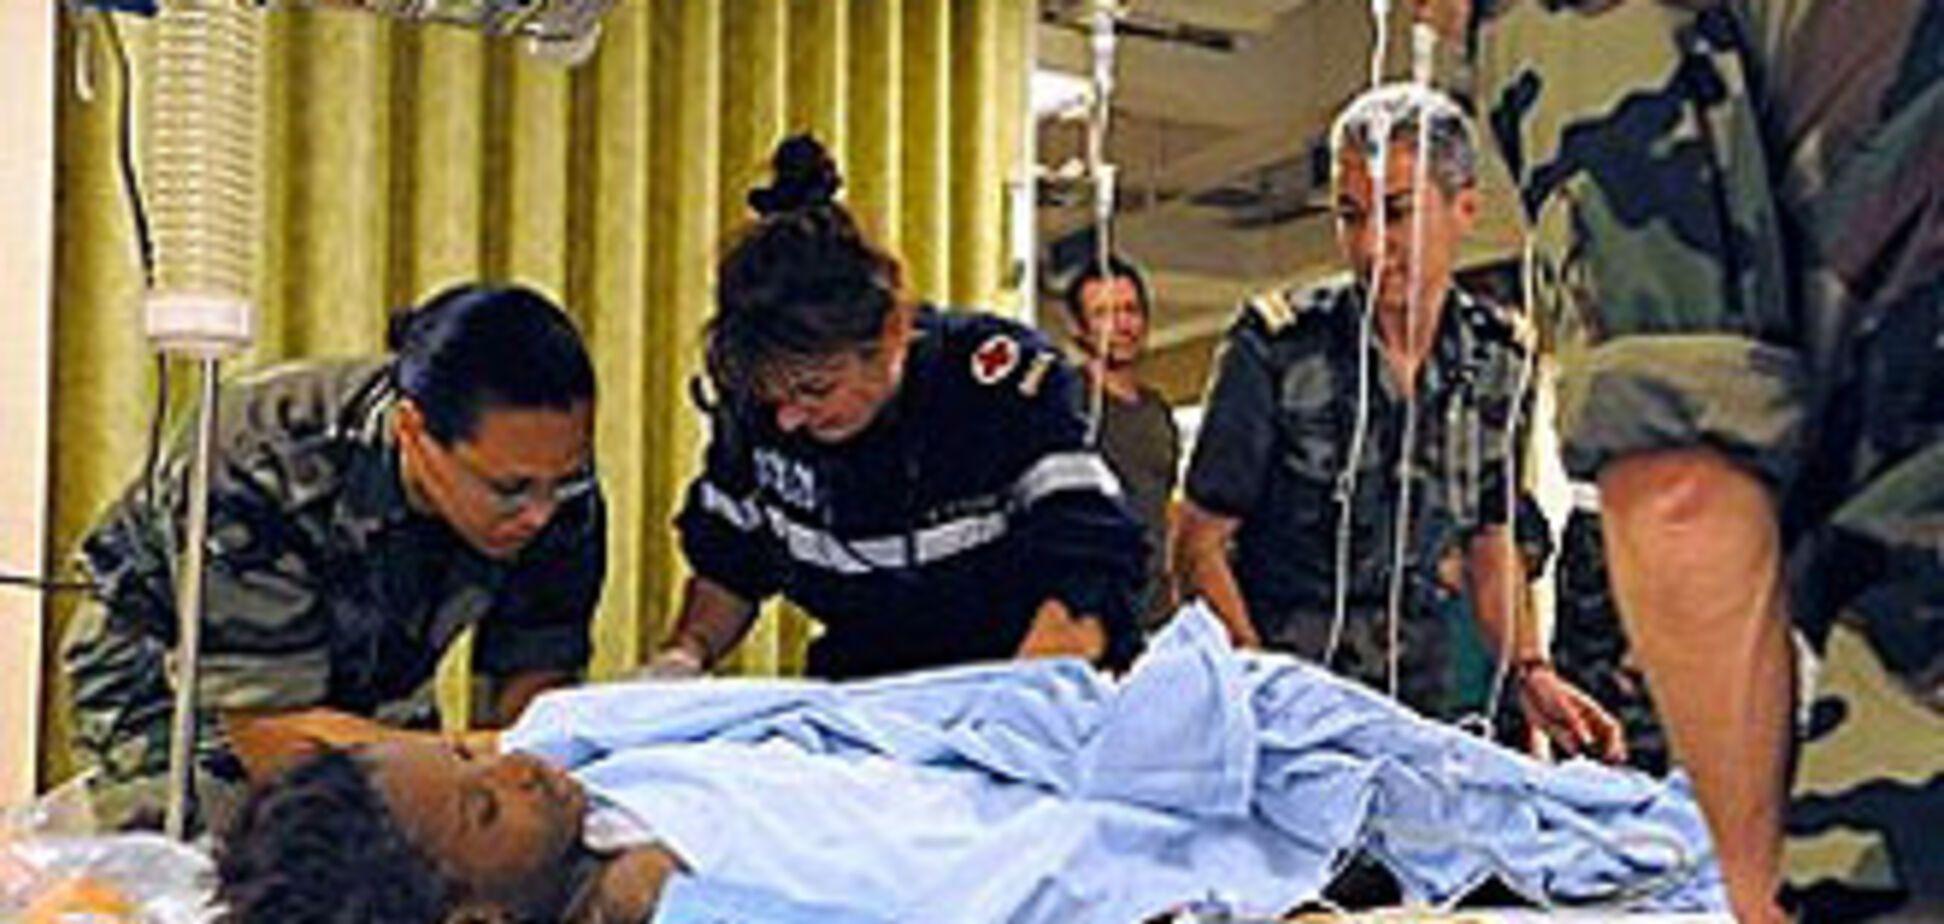 У Мексиці землетрус вбило 2 і поранило 233 людини